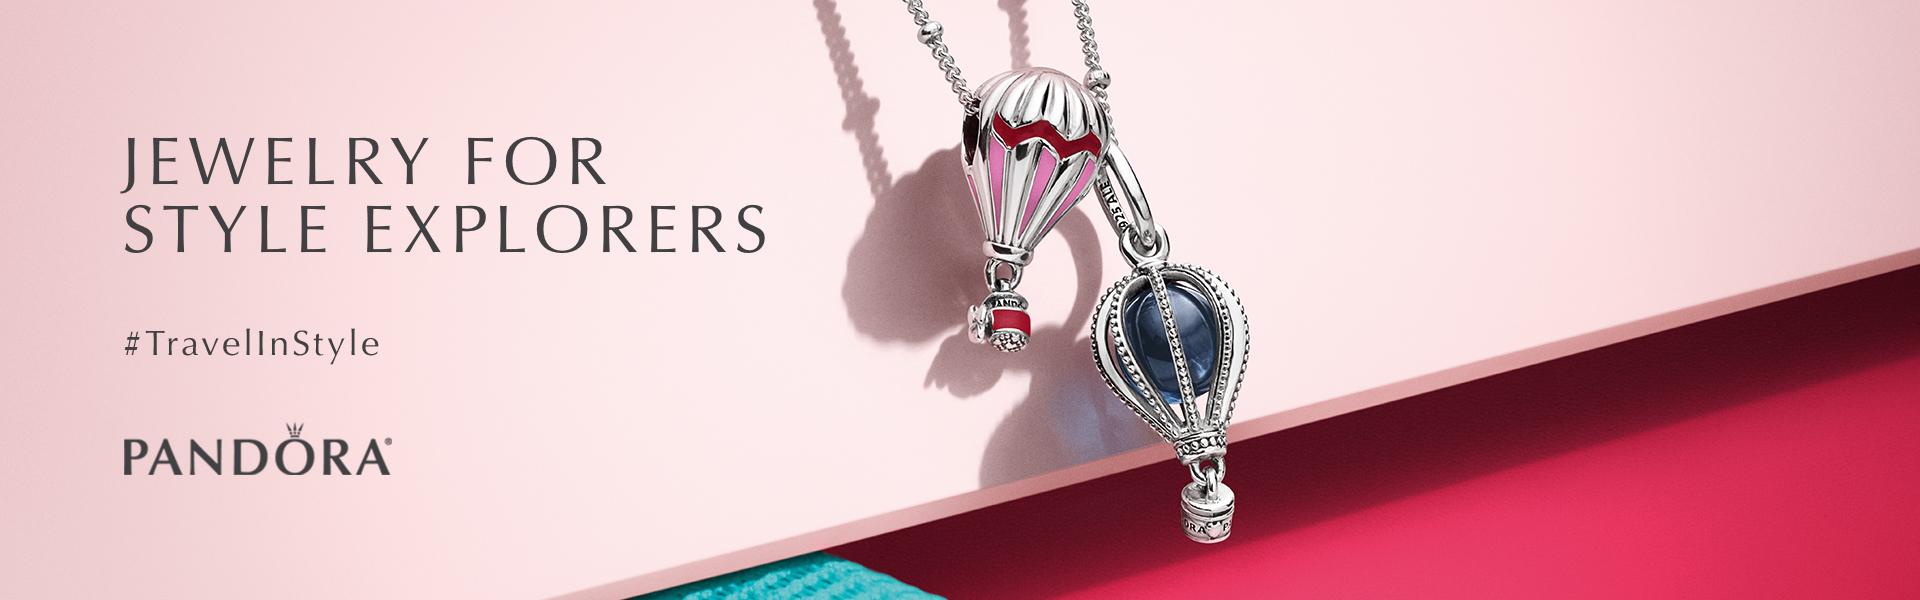 Pandora Jewelry For Style Explorers